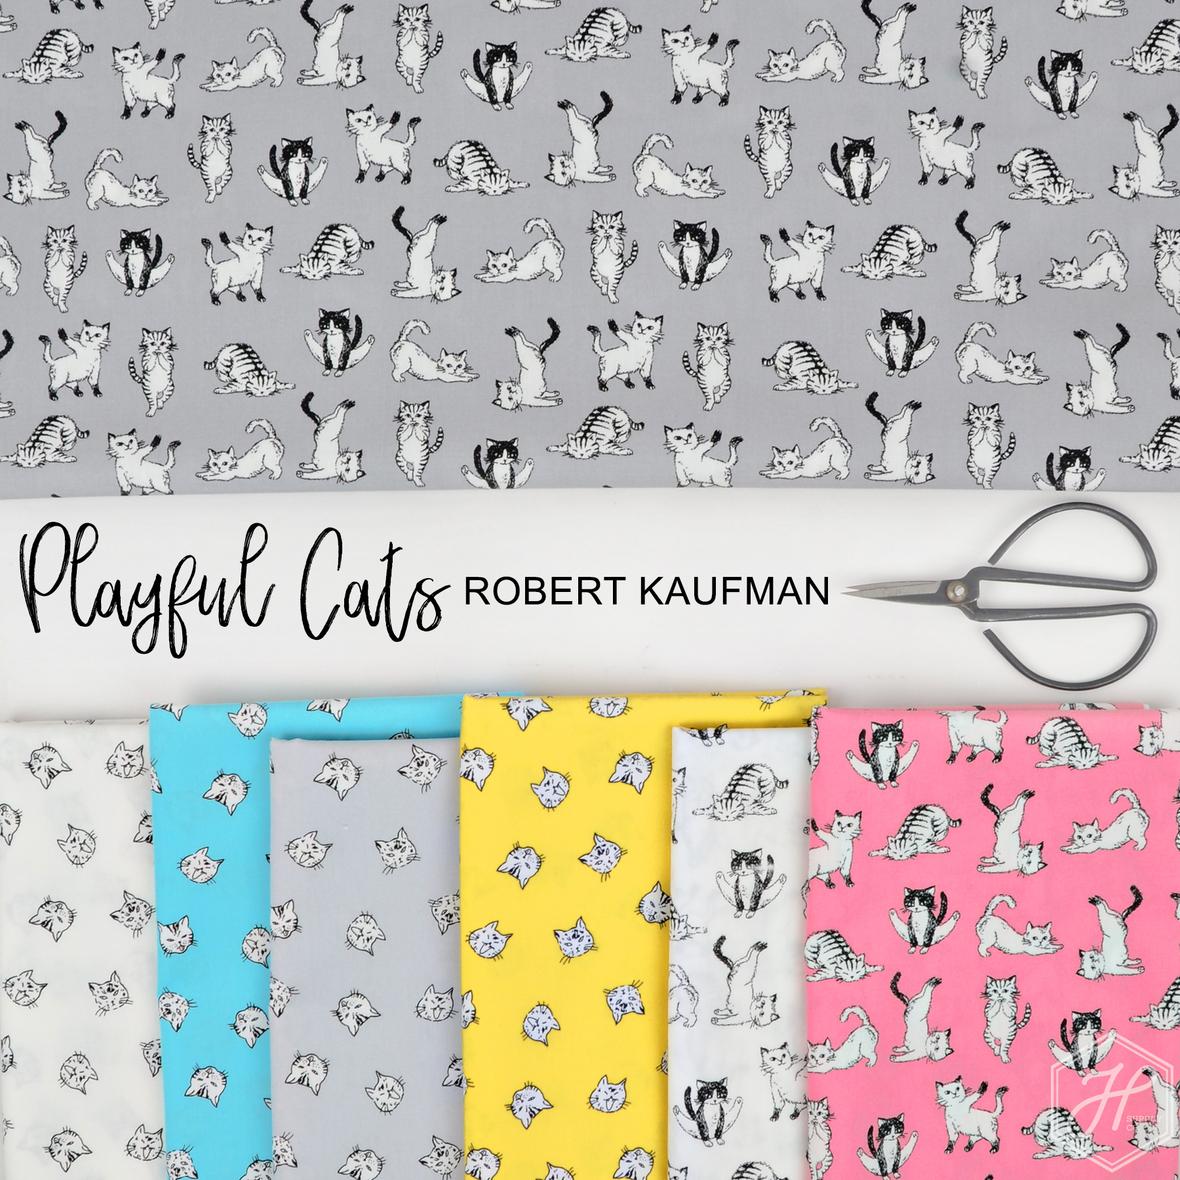 Playful Cats Robert Kaufman Fabric at Hawthorne Supply Co